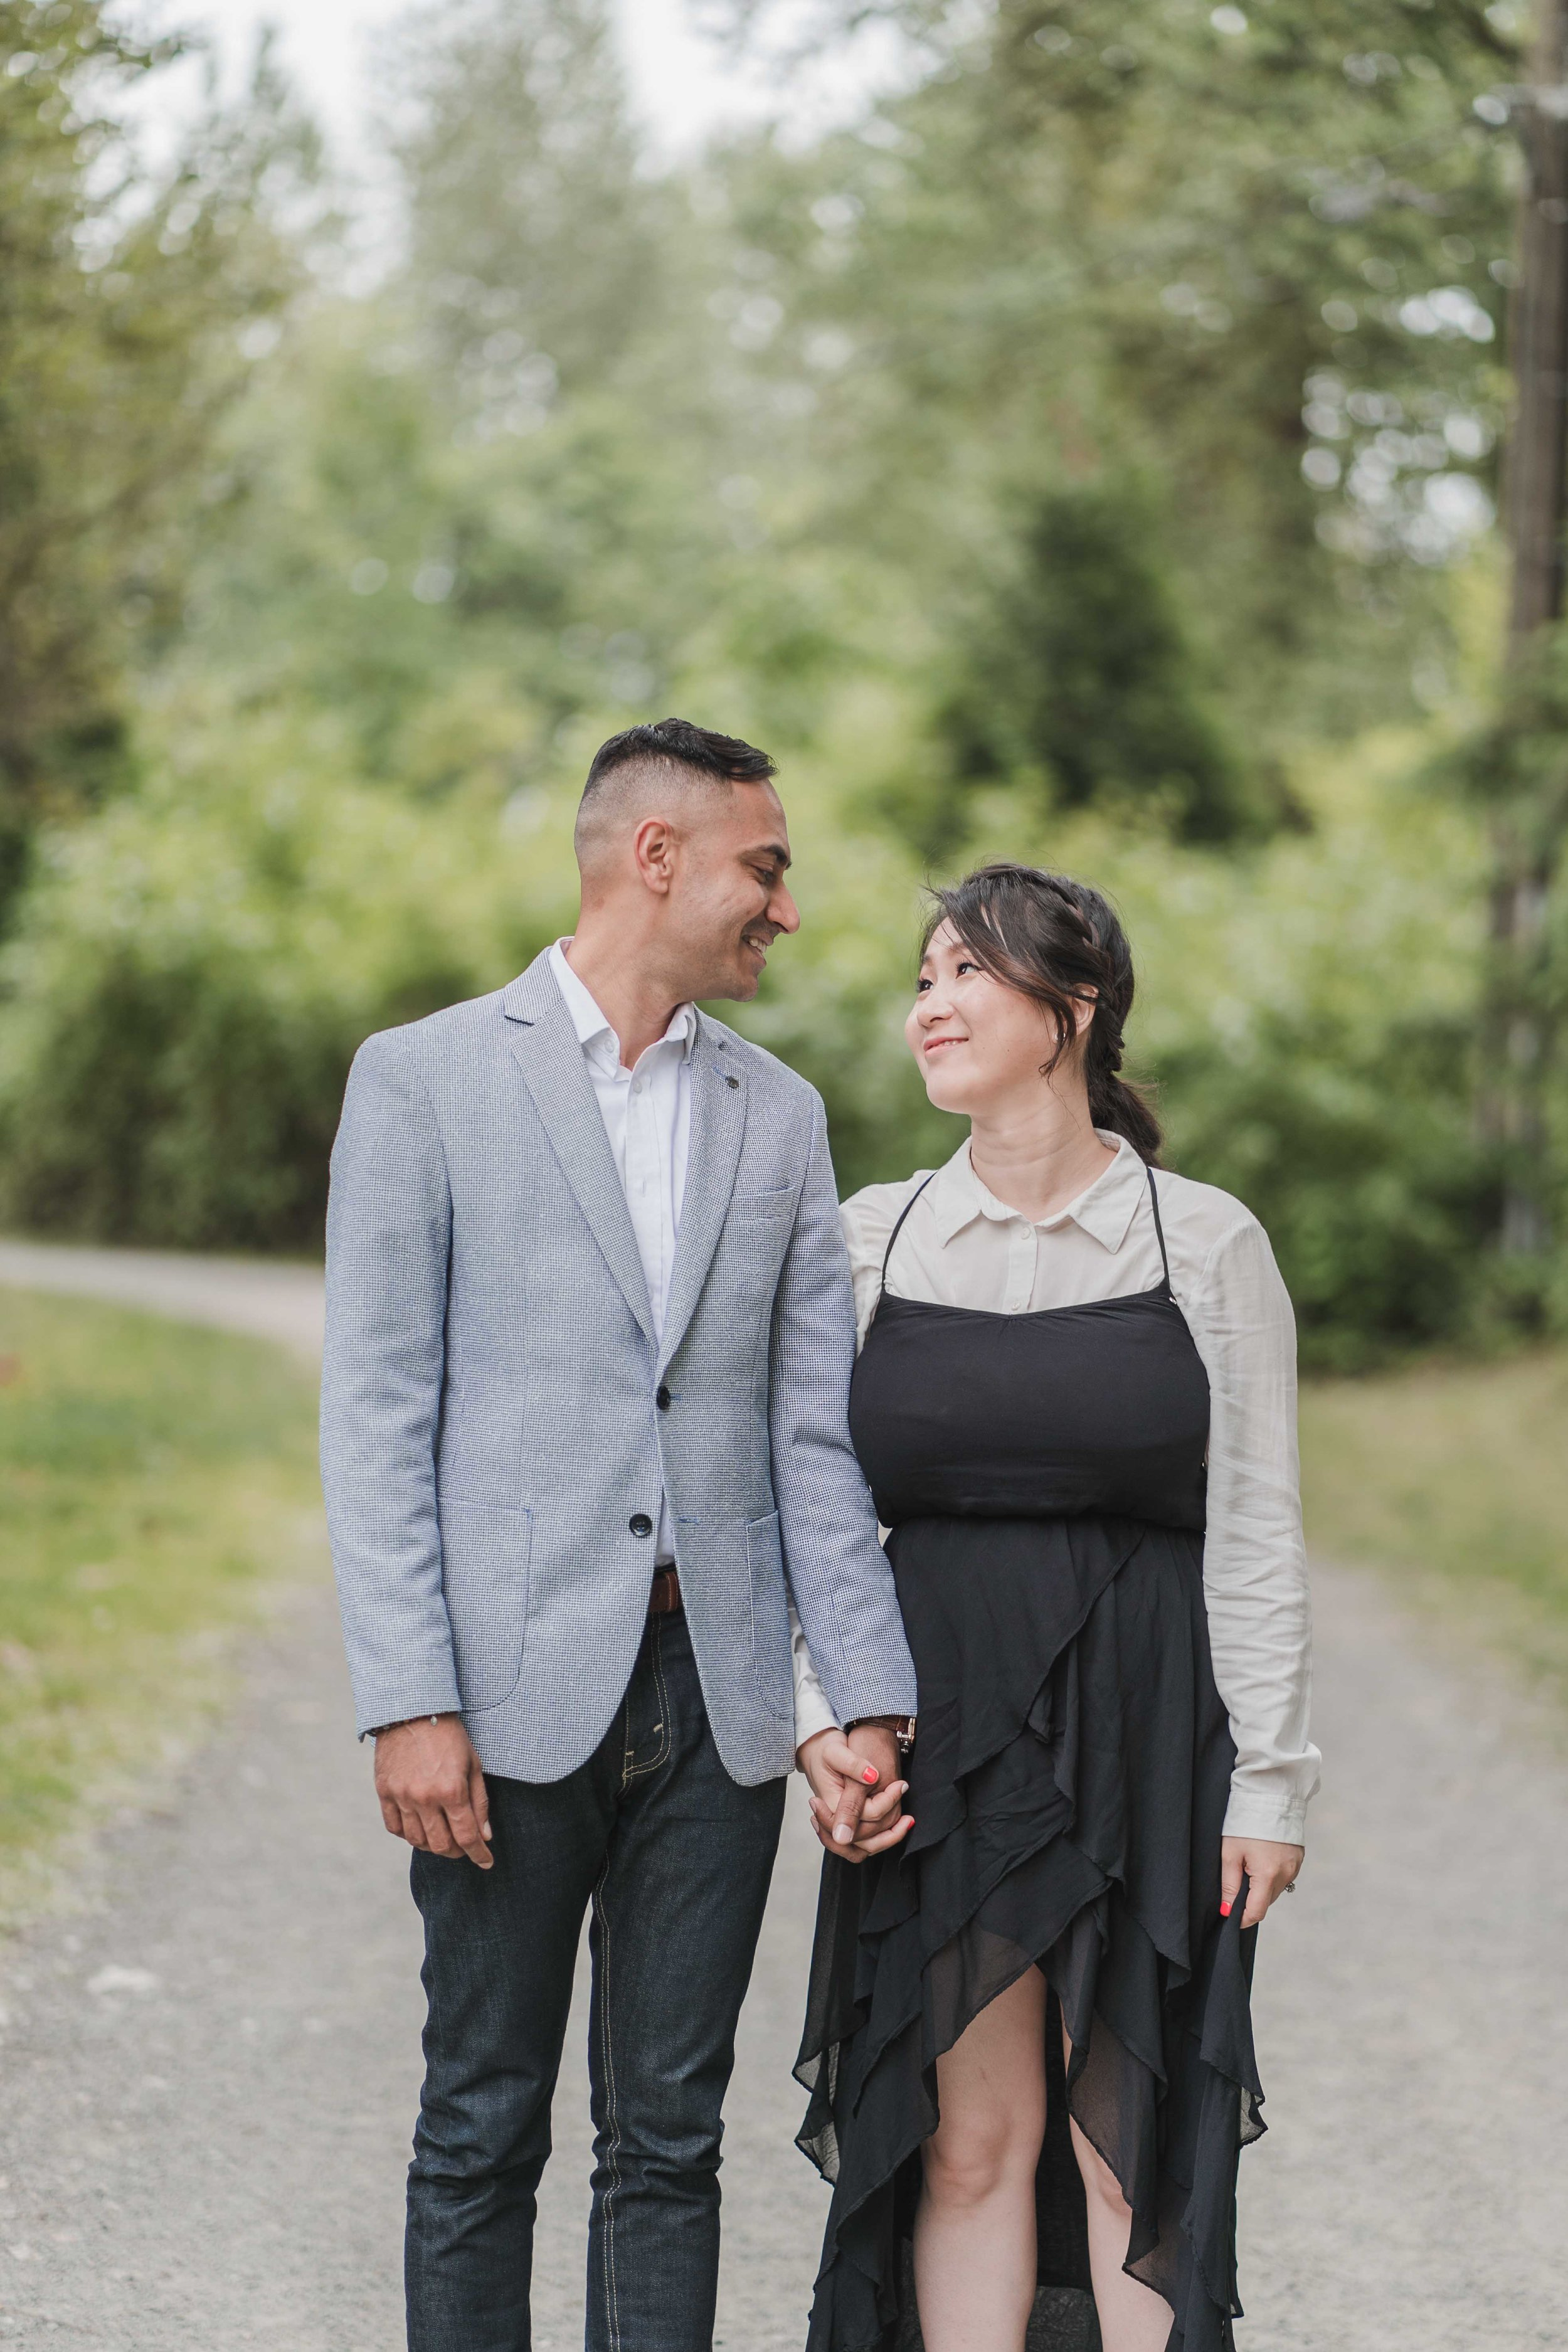 20190622 - Monika & Johnson Engagement - 0160.jpg